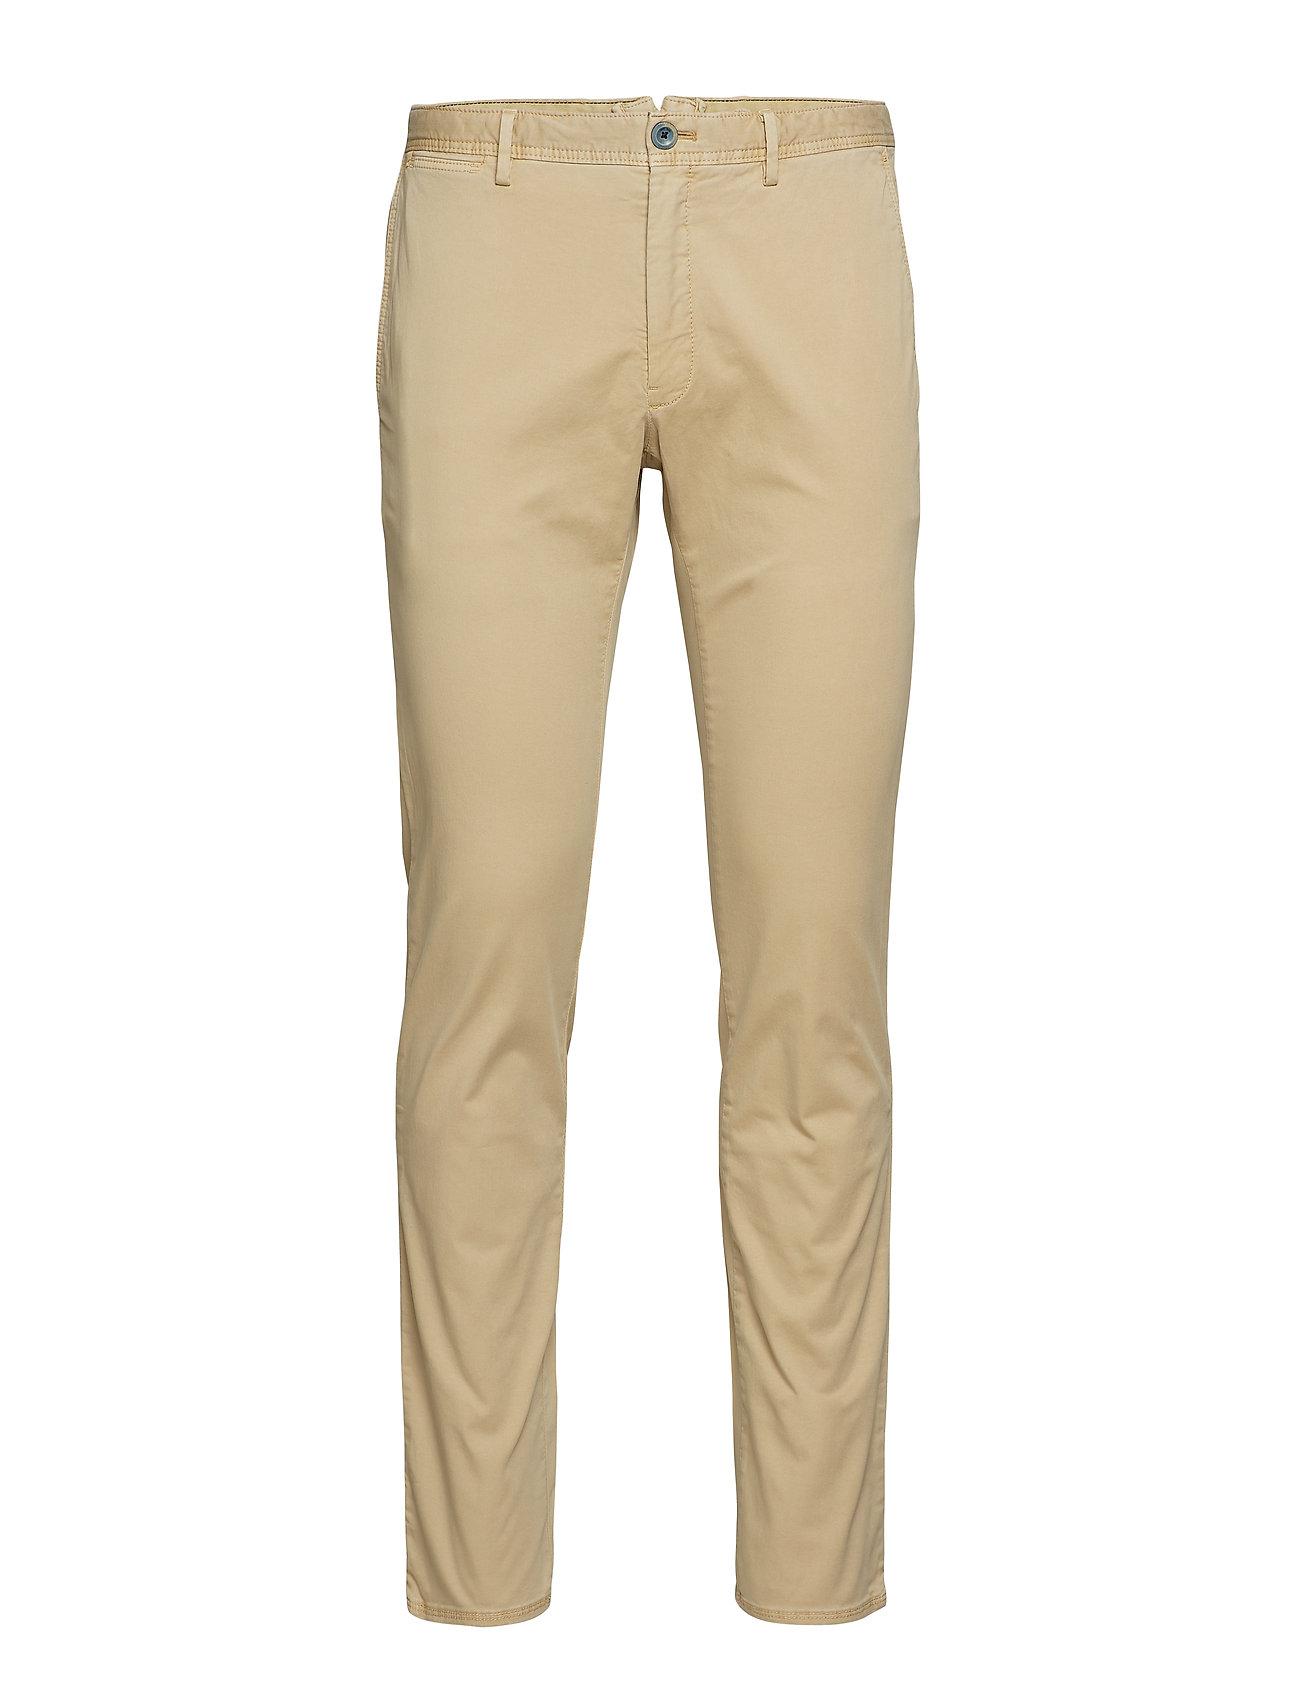 Mango Man Slim fit chino trousers - LIGHT BEIGE